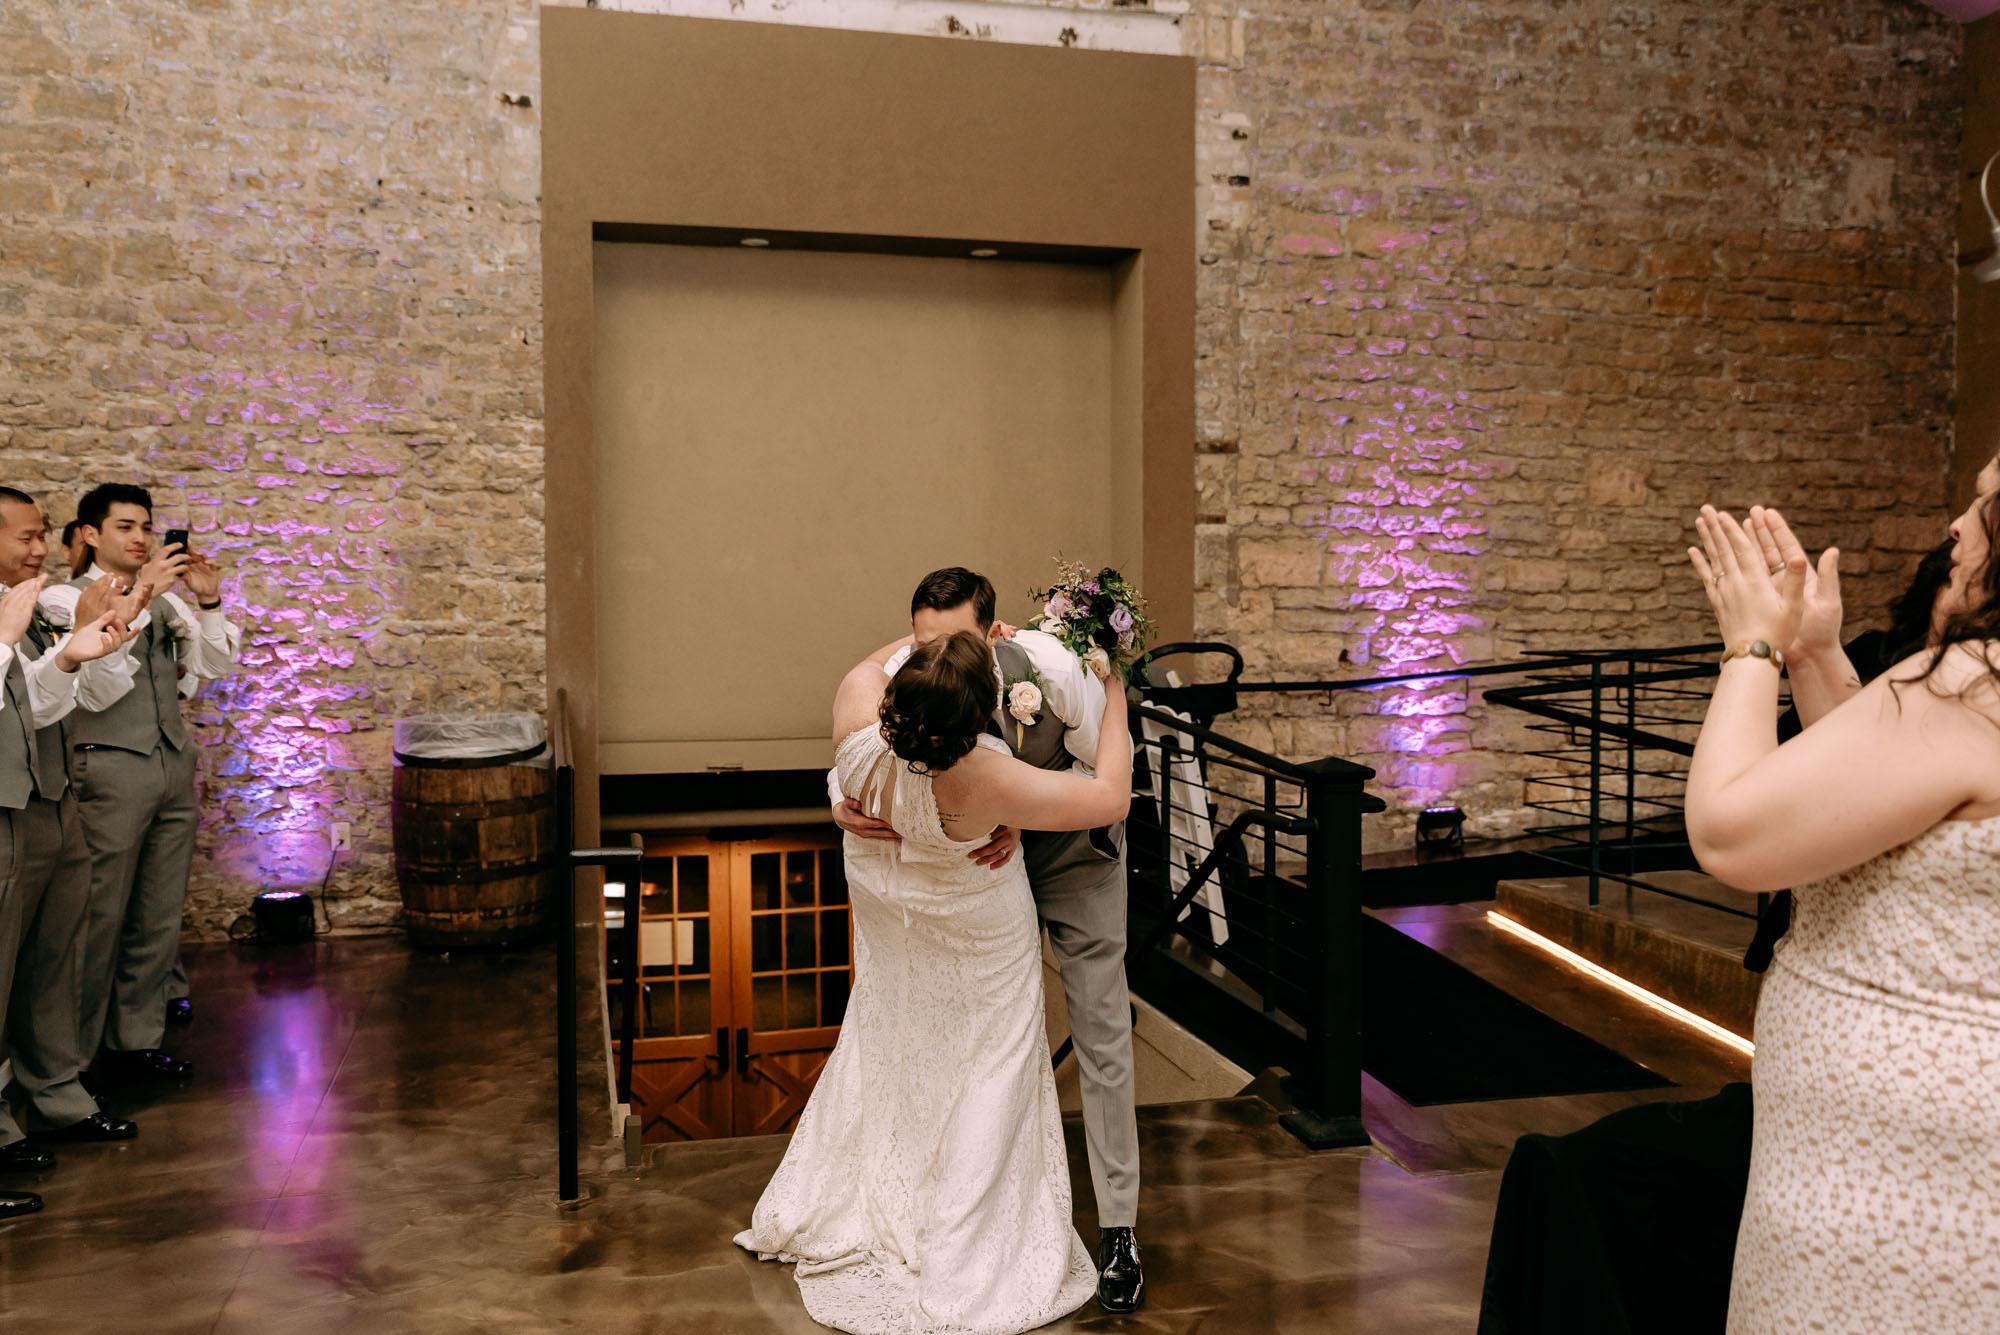 prairie-street-brewhouse-wedding-Rockford-IL-wedding-photographers-248.jpg